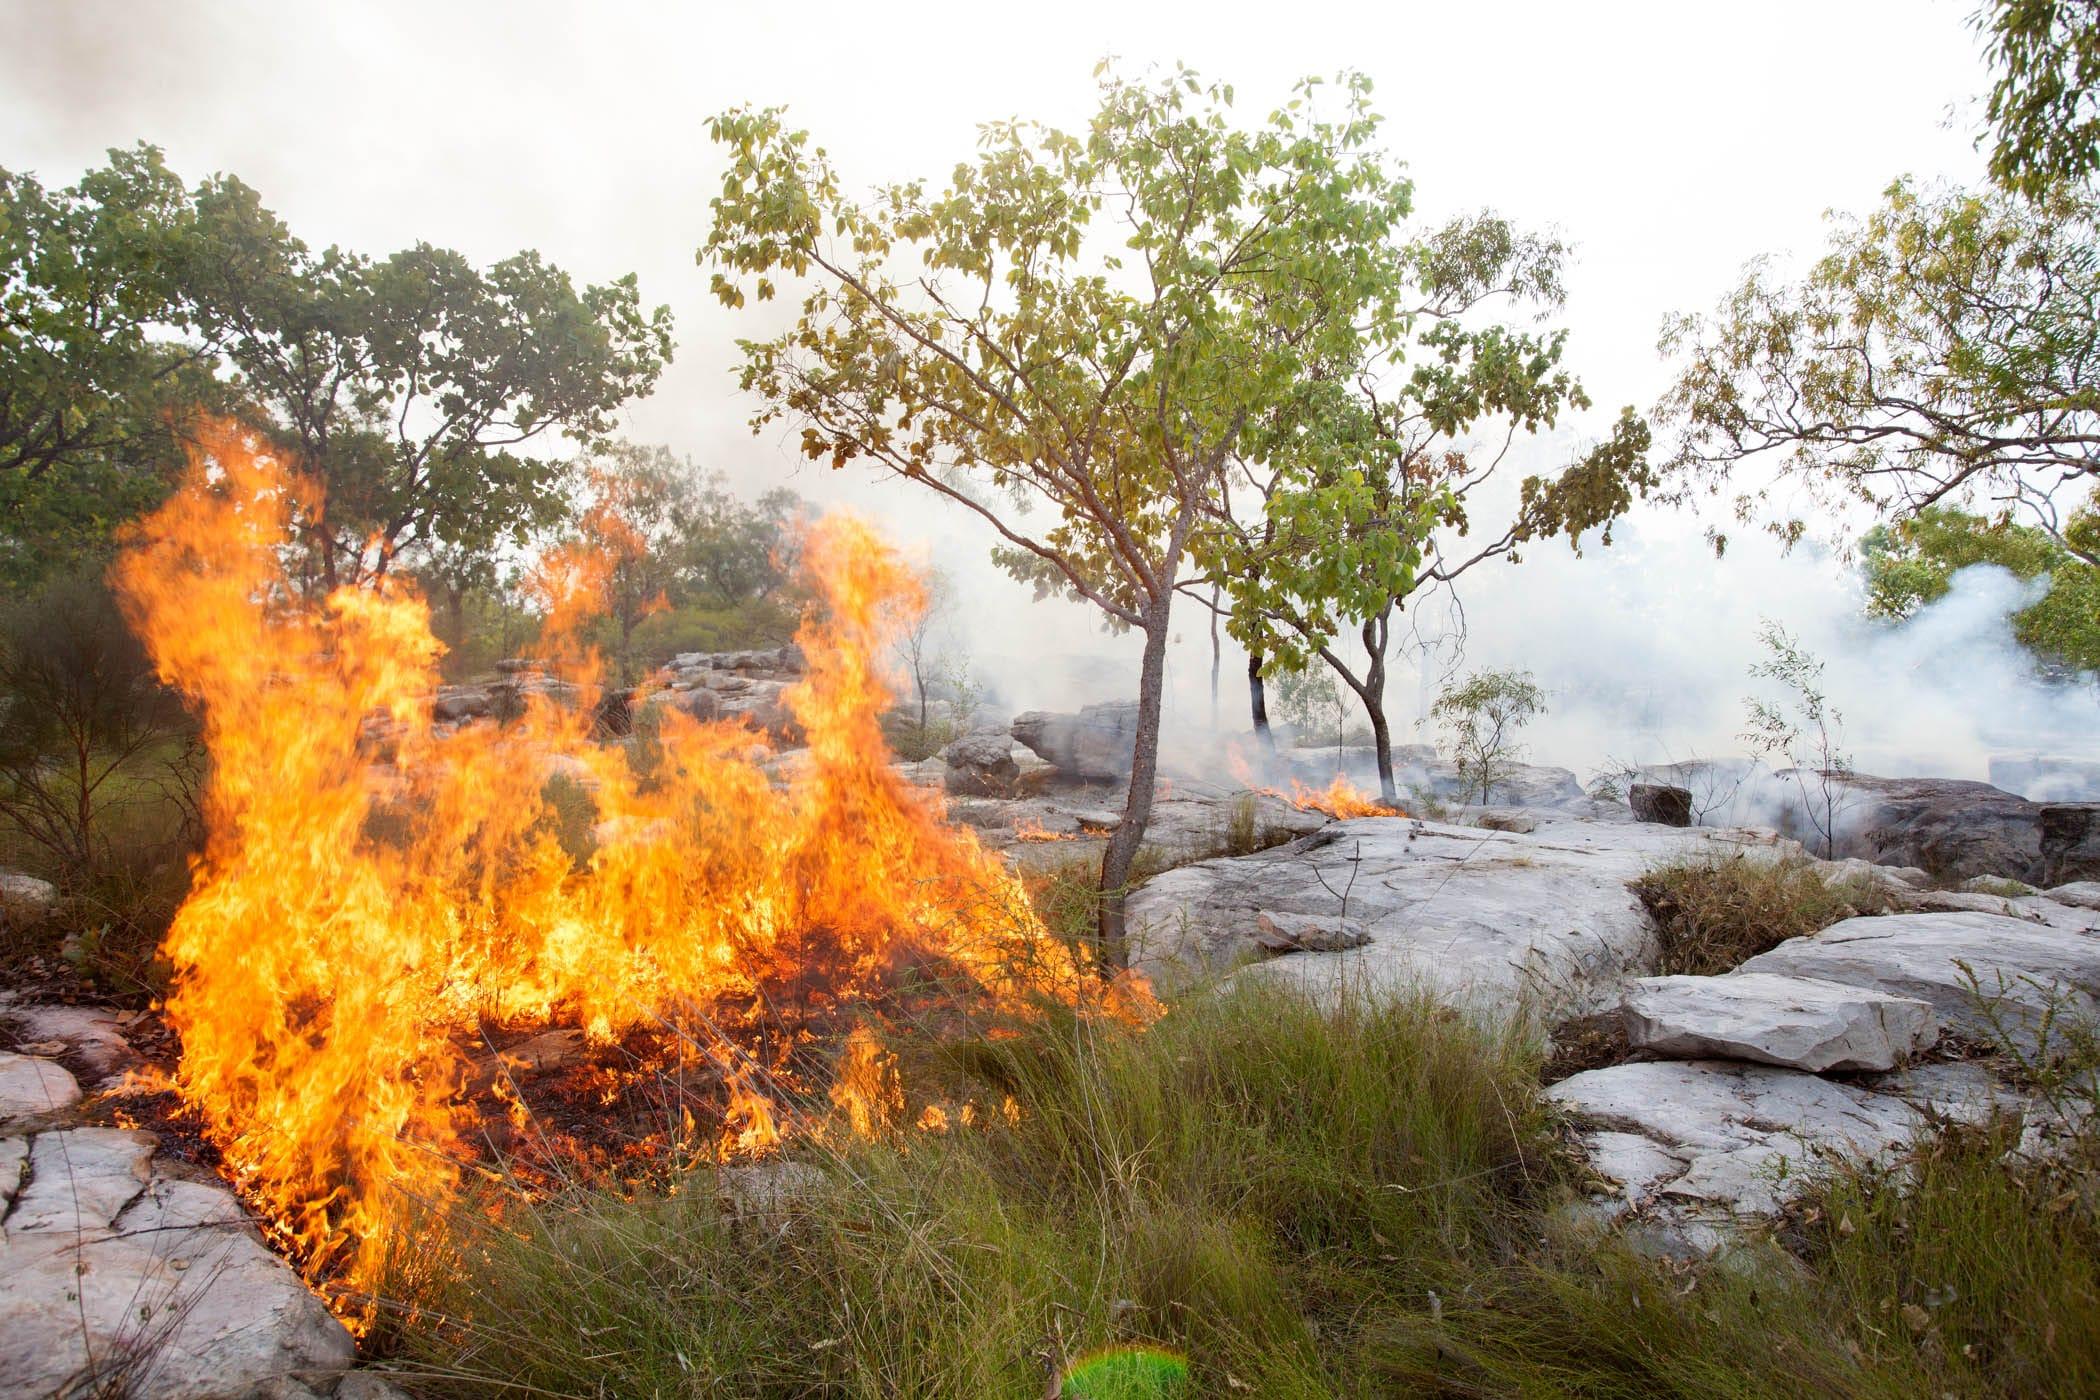 Savanna Burning Methodology